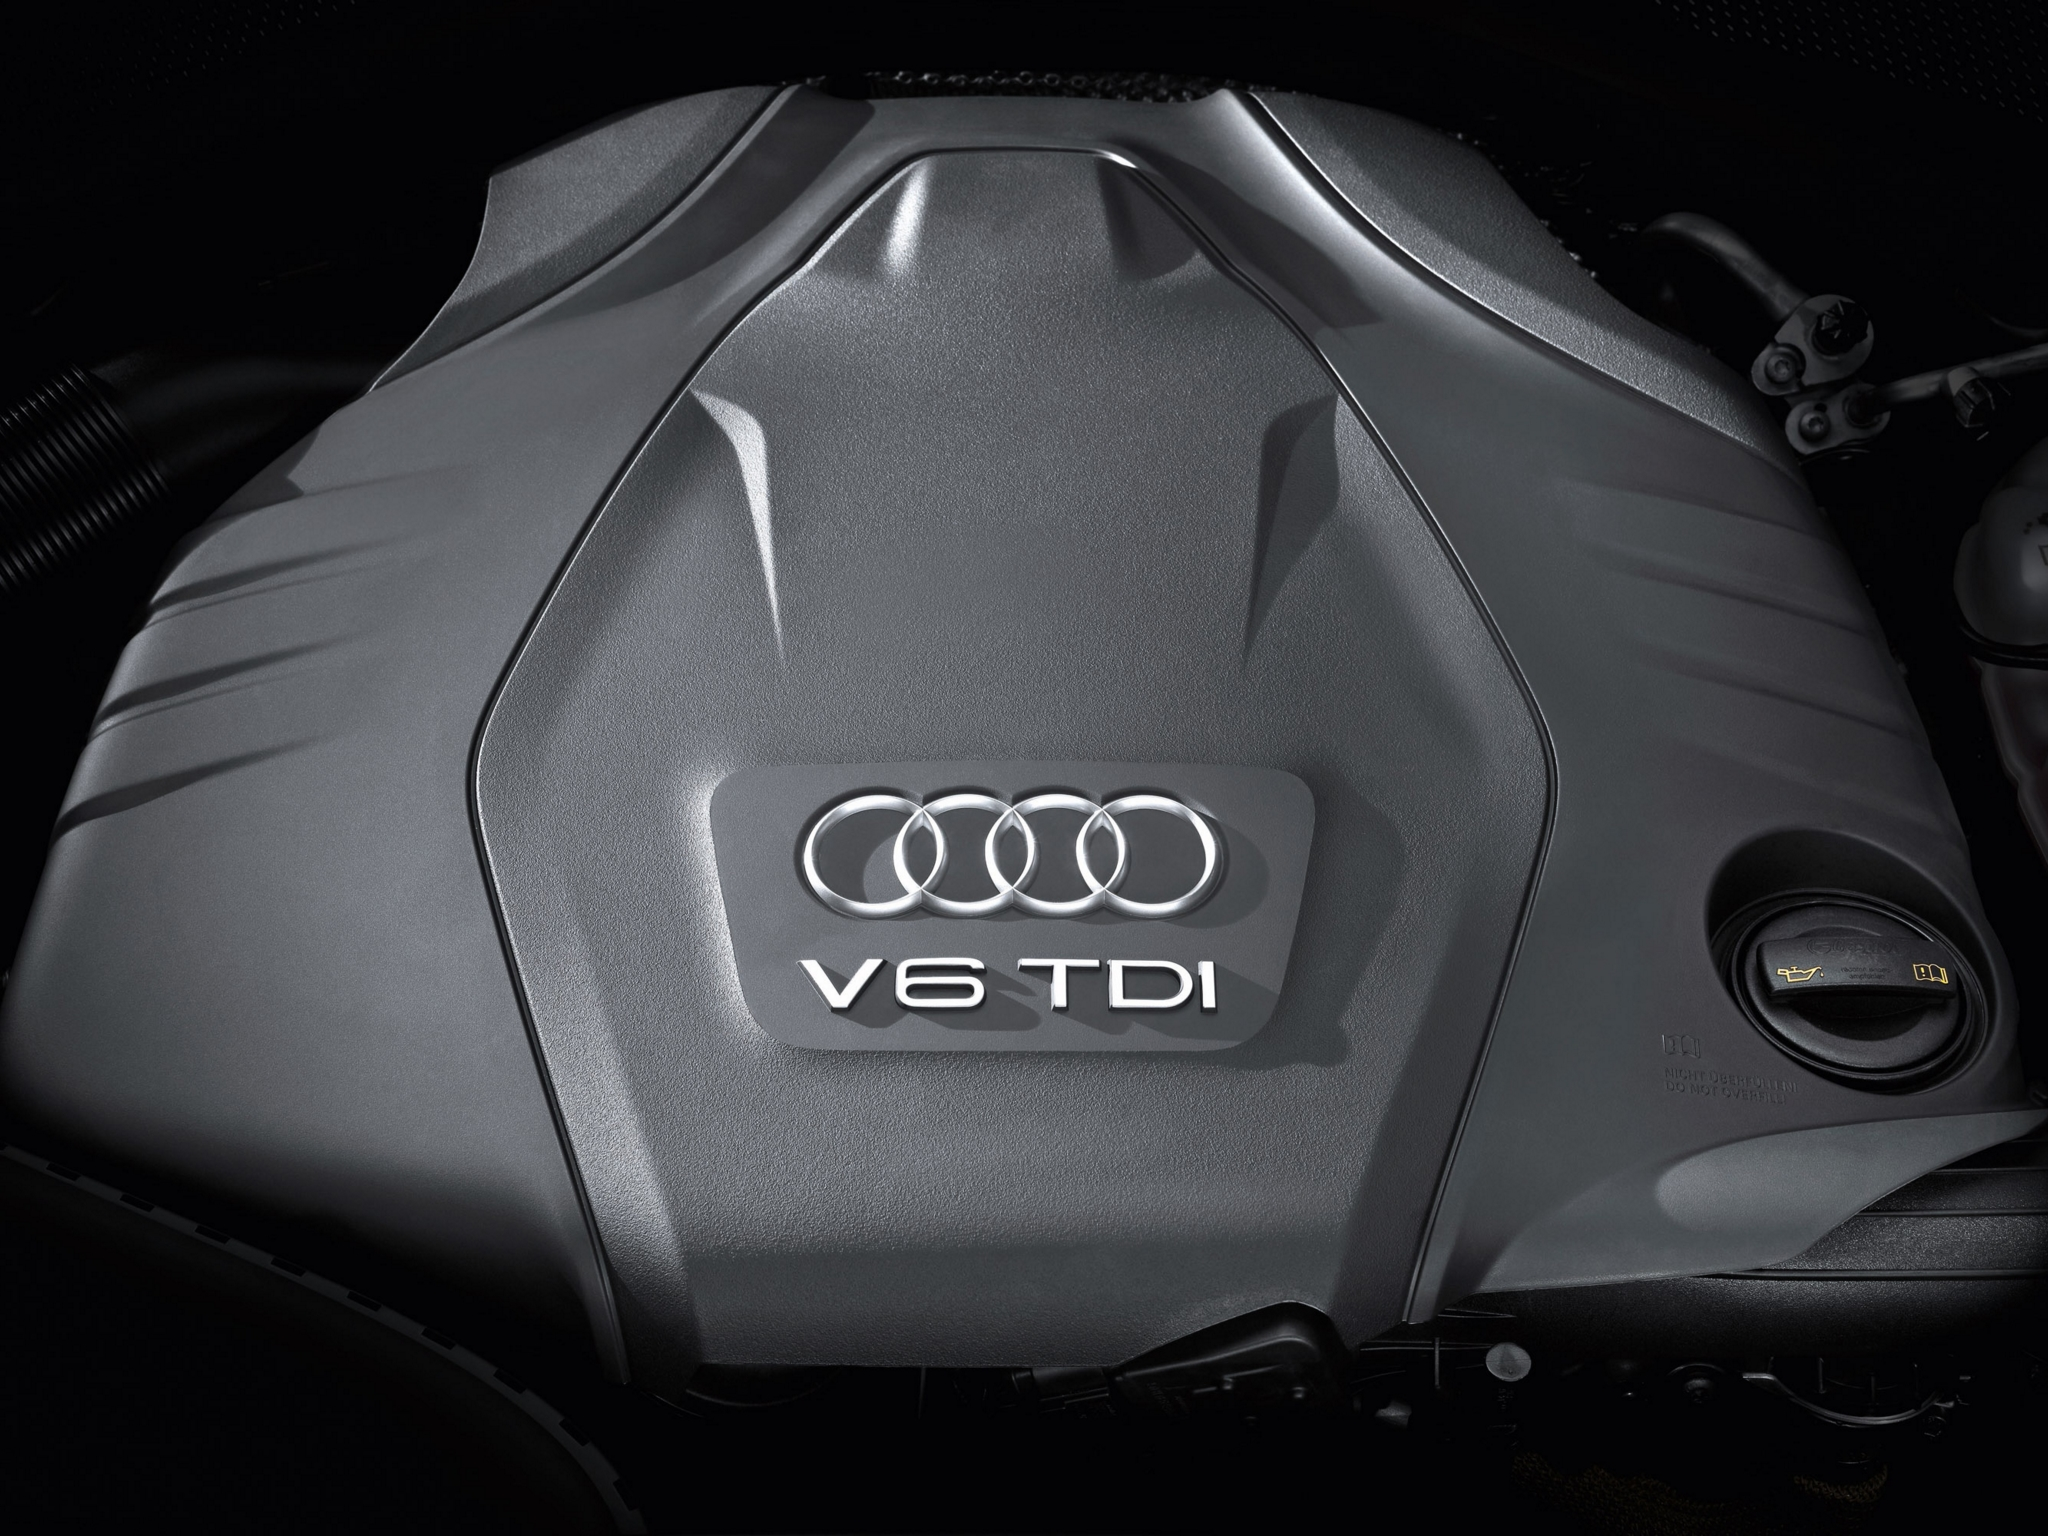 Audi A7 motor